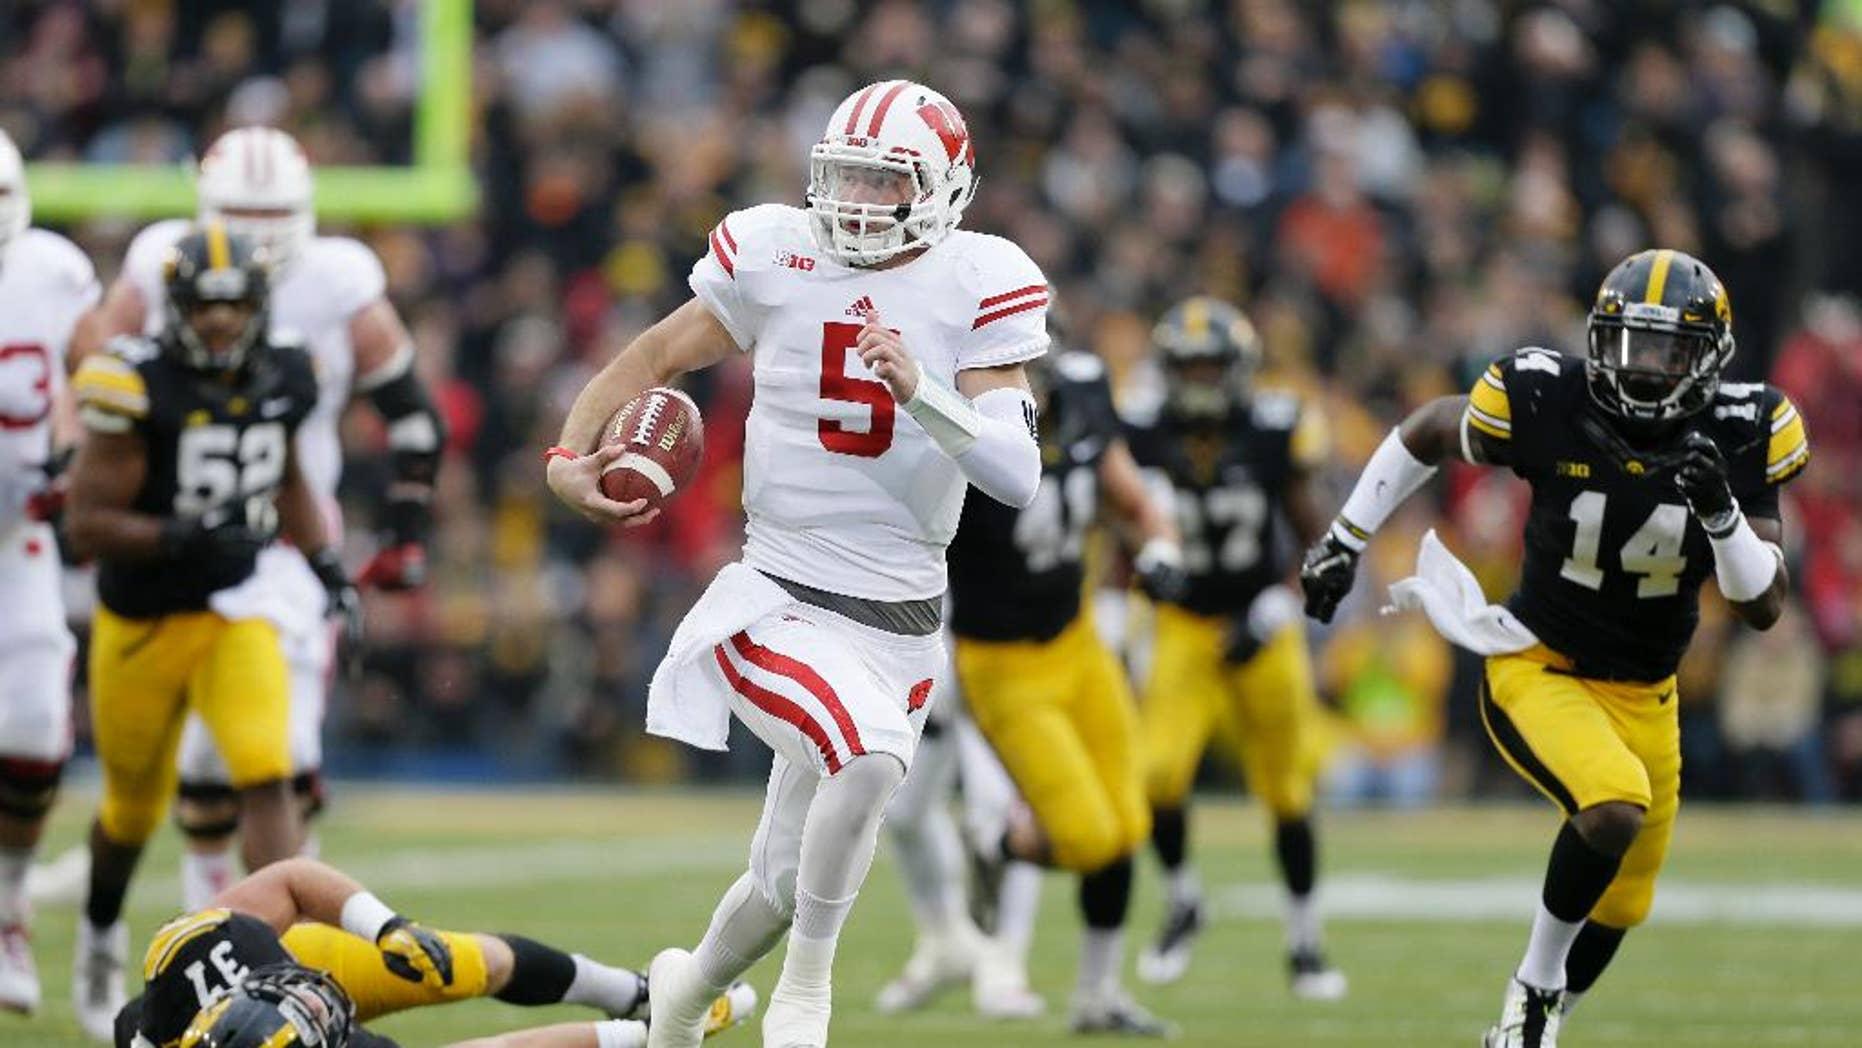 Wisconsin quarterback Tanner McEvoy (5) runs from Iowa defensive back John Lowdermilk (37) and defensive back Desmond King (14) during a 45-yard touchdown run in the first half of an NCAA college football game, Saturday, Nov. 22, 2014, in Iowa City, Iowa. (AP Photo/Charlie Neibergall)